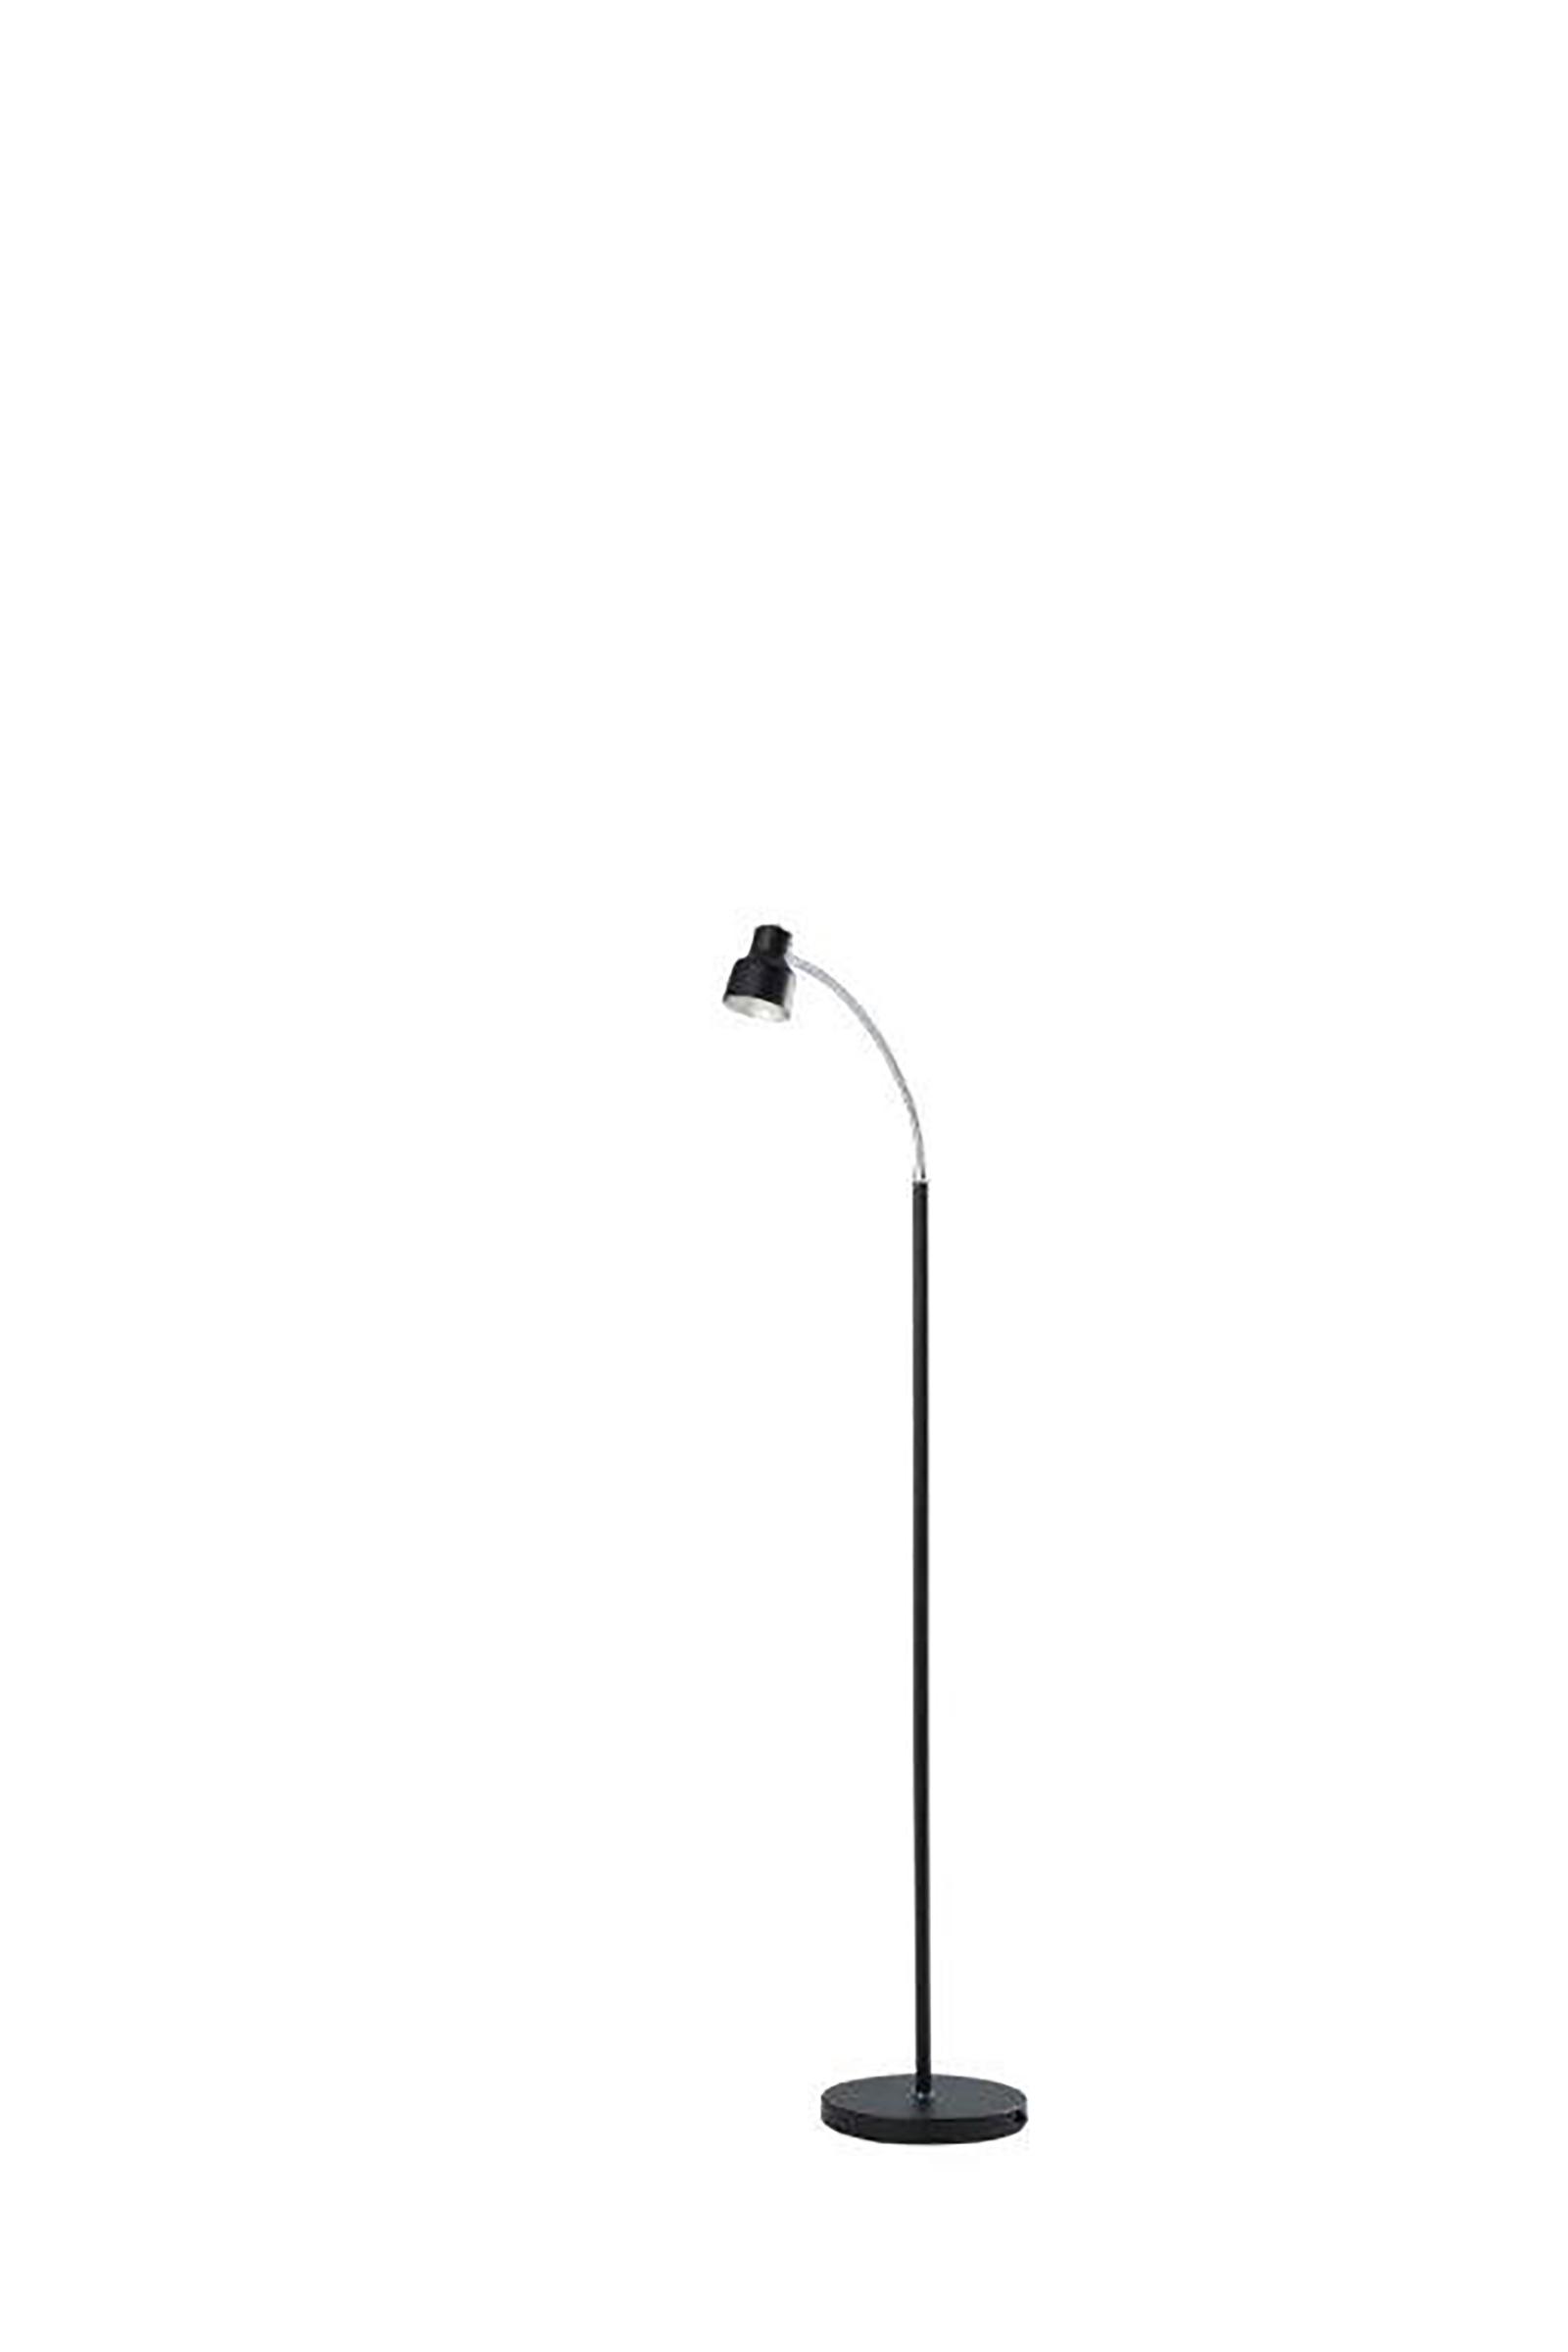 48 In Landri Led Gooseneck Satin Black Mini Reading Floor Lamp